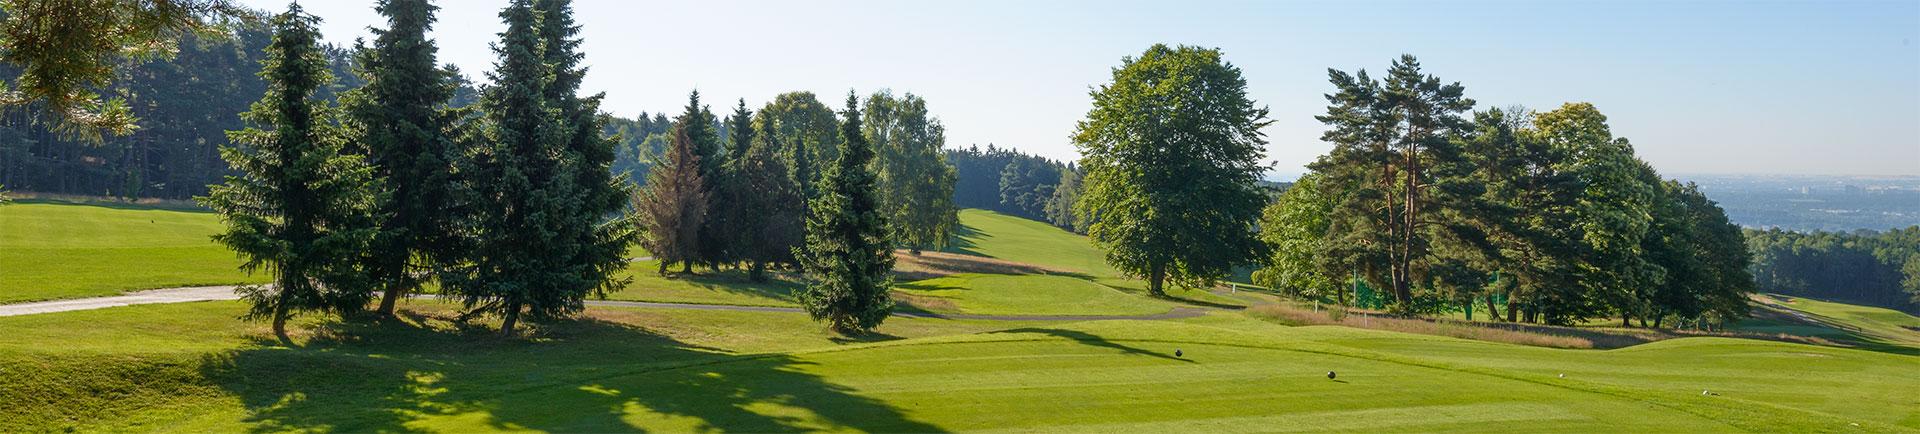 rheinblick-golfcourse-18